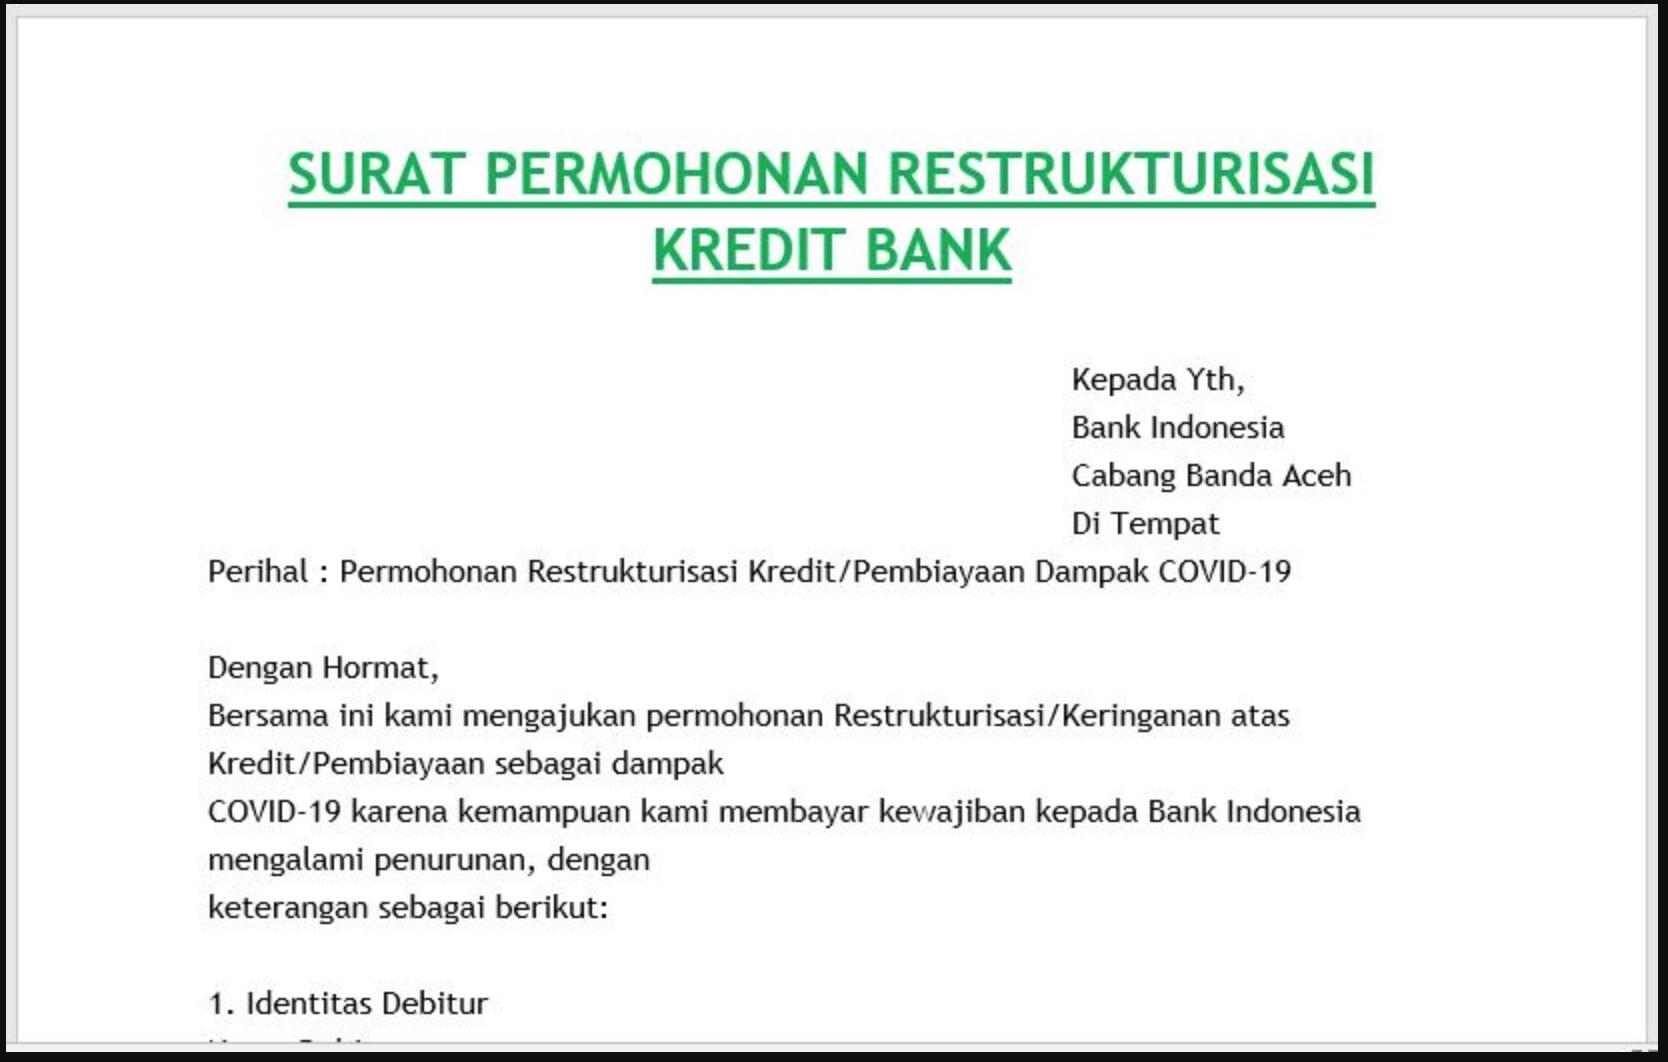 Surat Permohonan Restrukturisasi Kredit Bank Pengikut Surat Kelahiran Anak